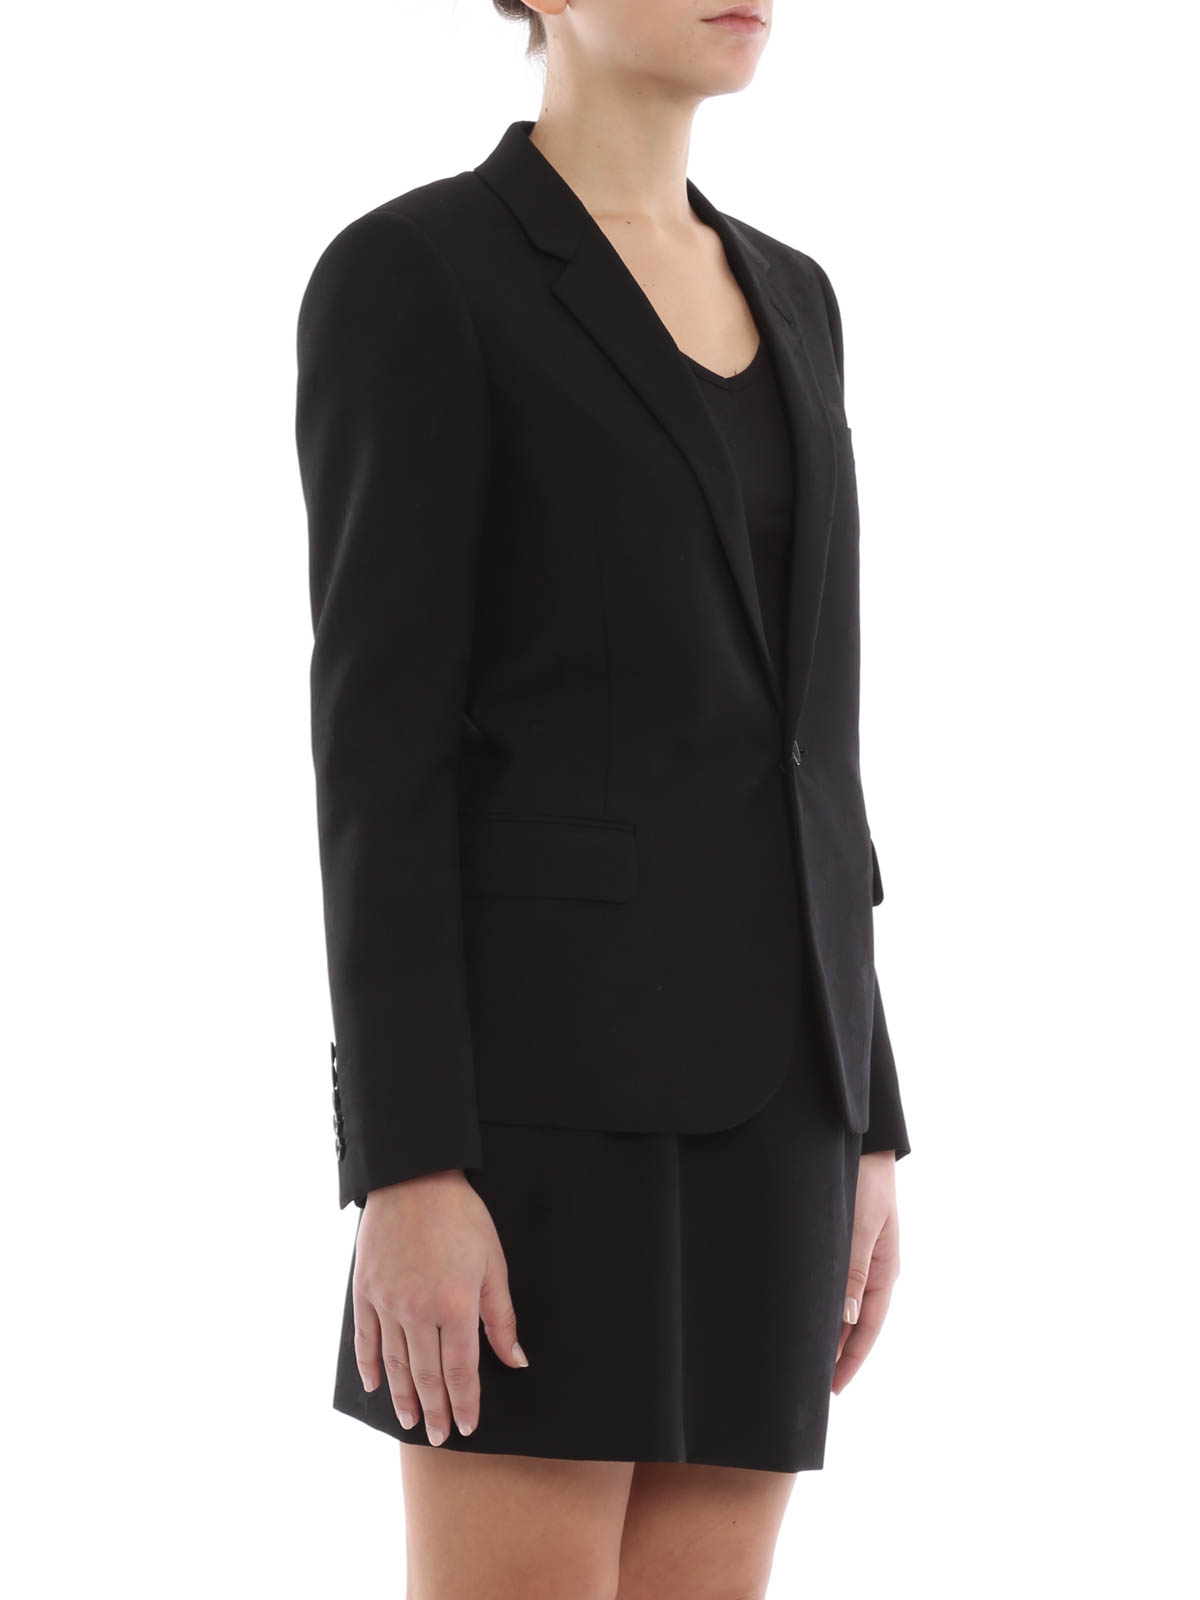 cheap for discount 4afd8 9feb2 Saint Laurent - Giacca di lana con motivi a stella - giacche ...